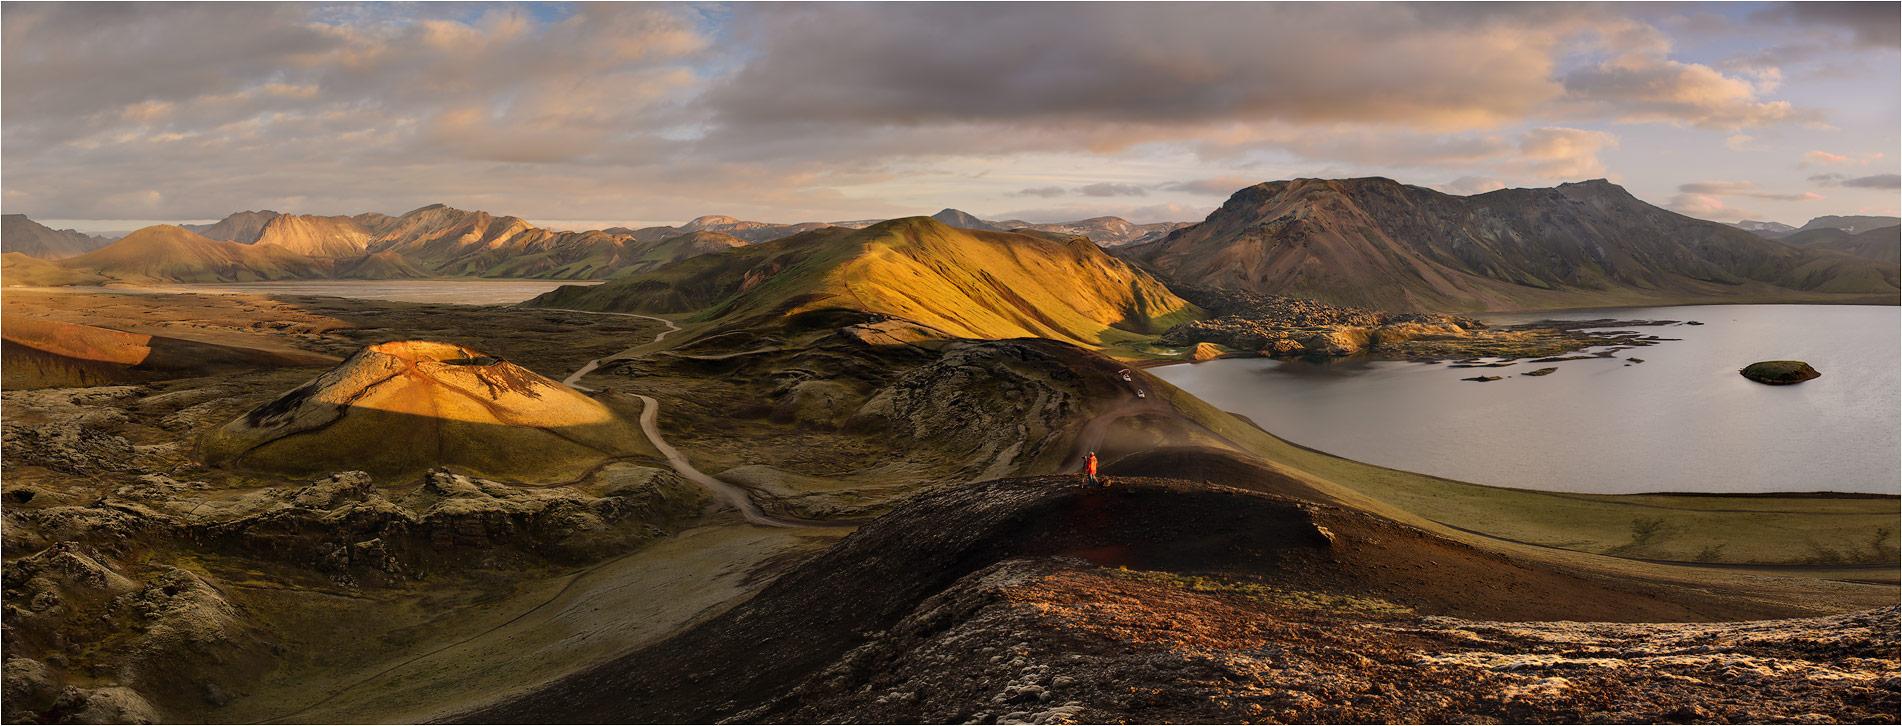 Исландия IV